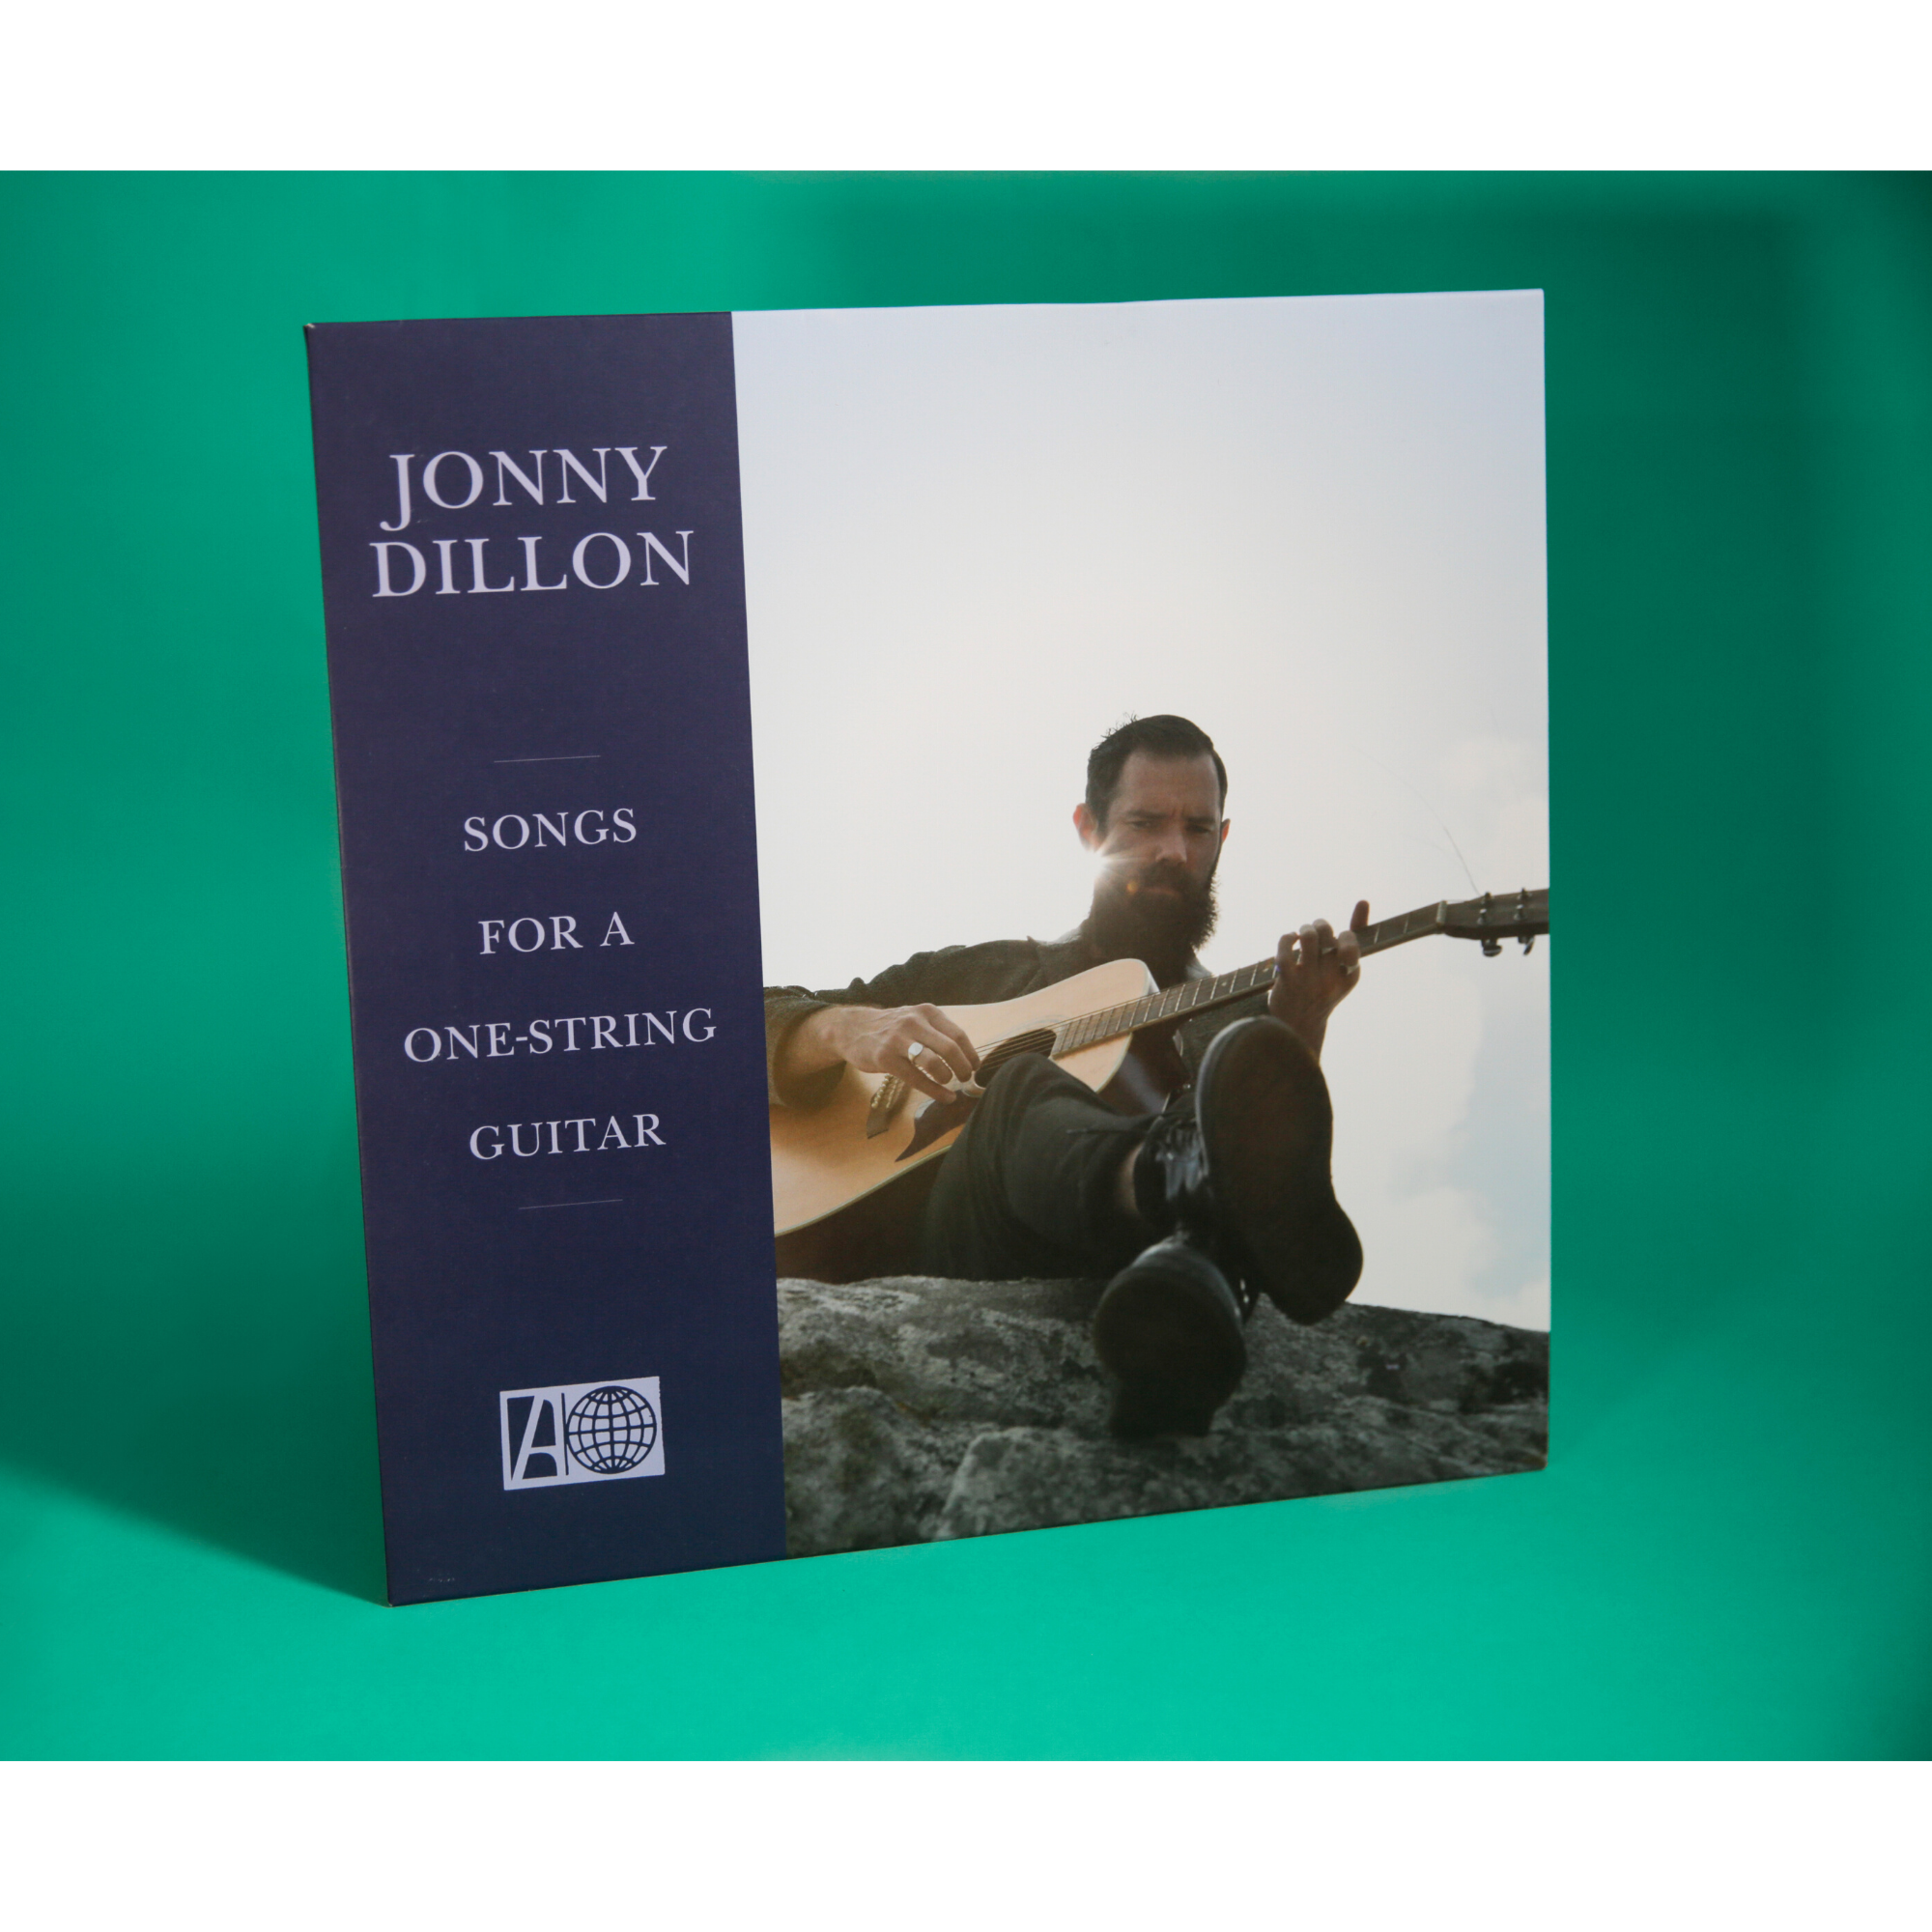 All City Dublin Jonny Dillon - Songs For A One-String Guitar